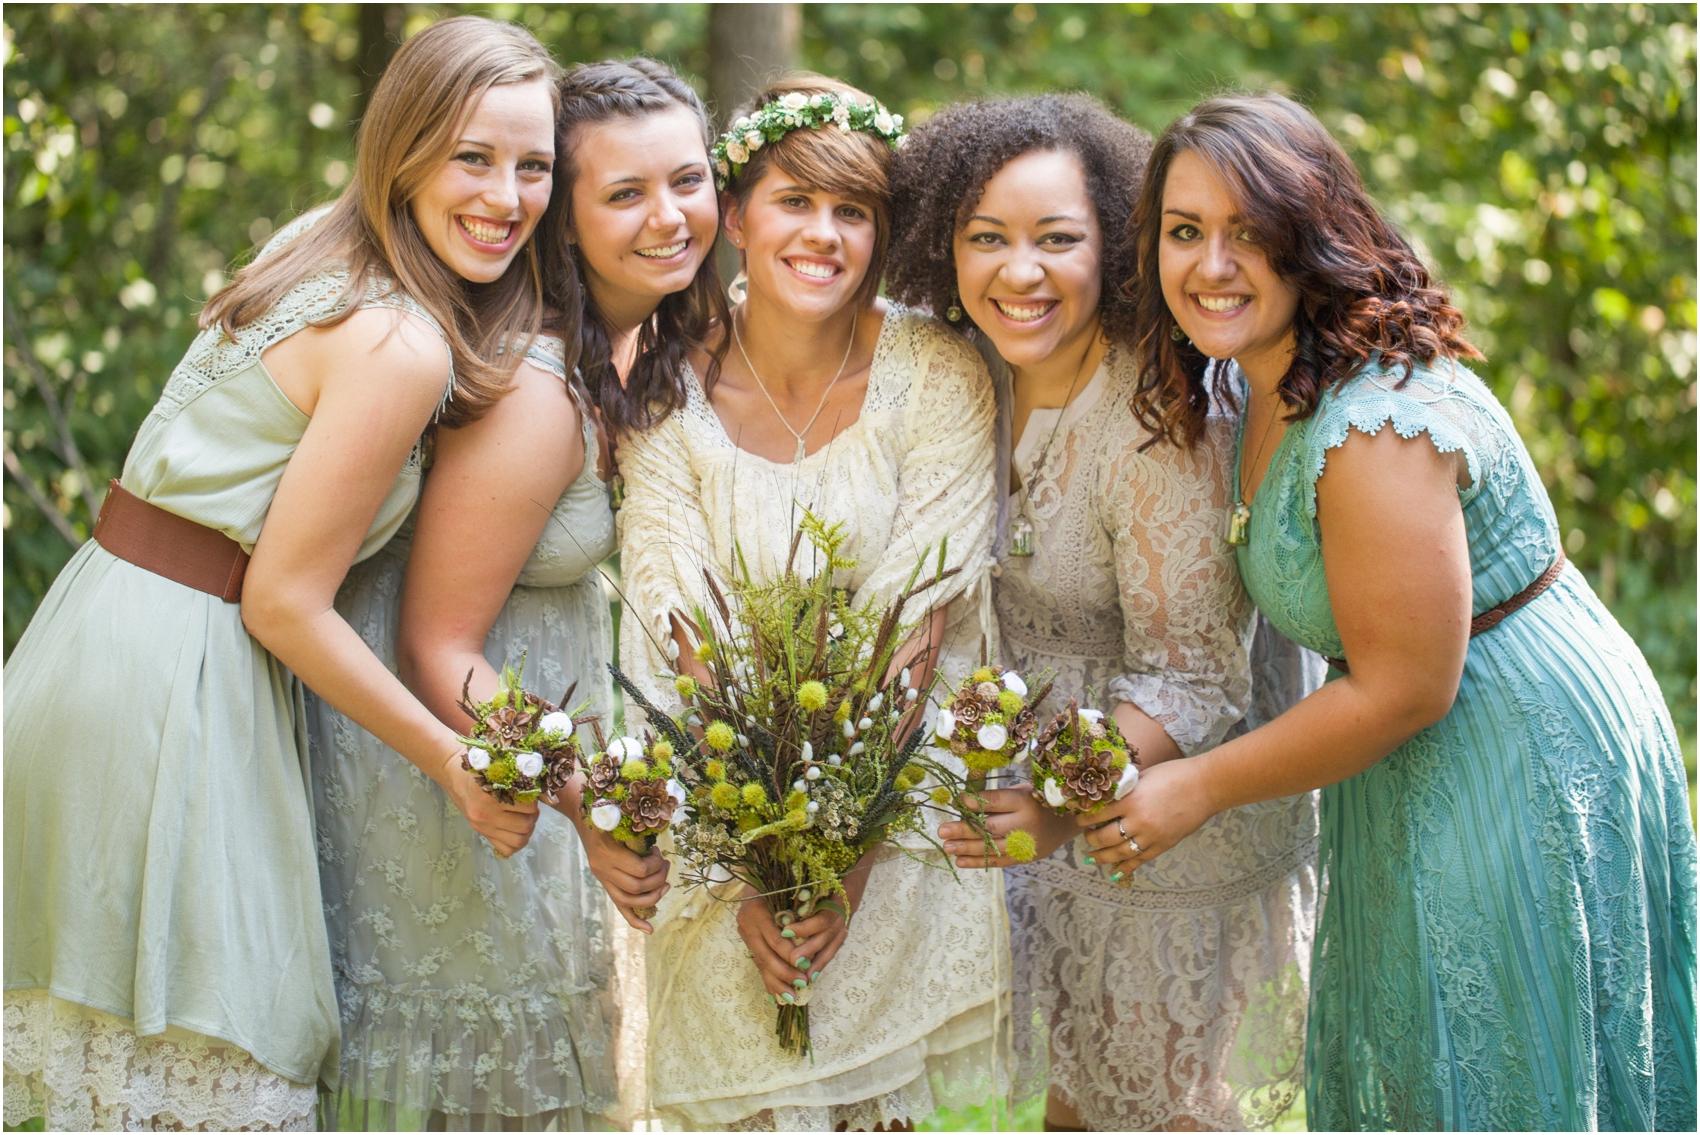 Southern-Illinois-Bohemian-Holy-Boulders-Autumn-Wedding_0923.jpg